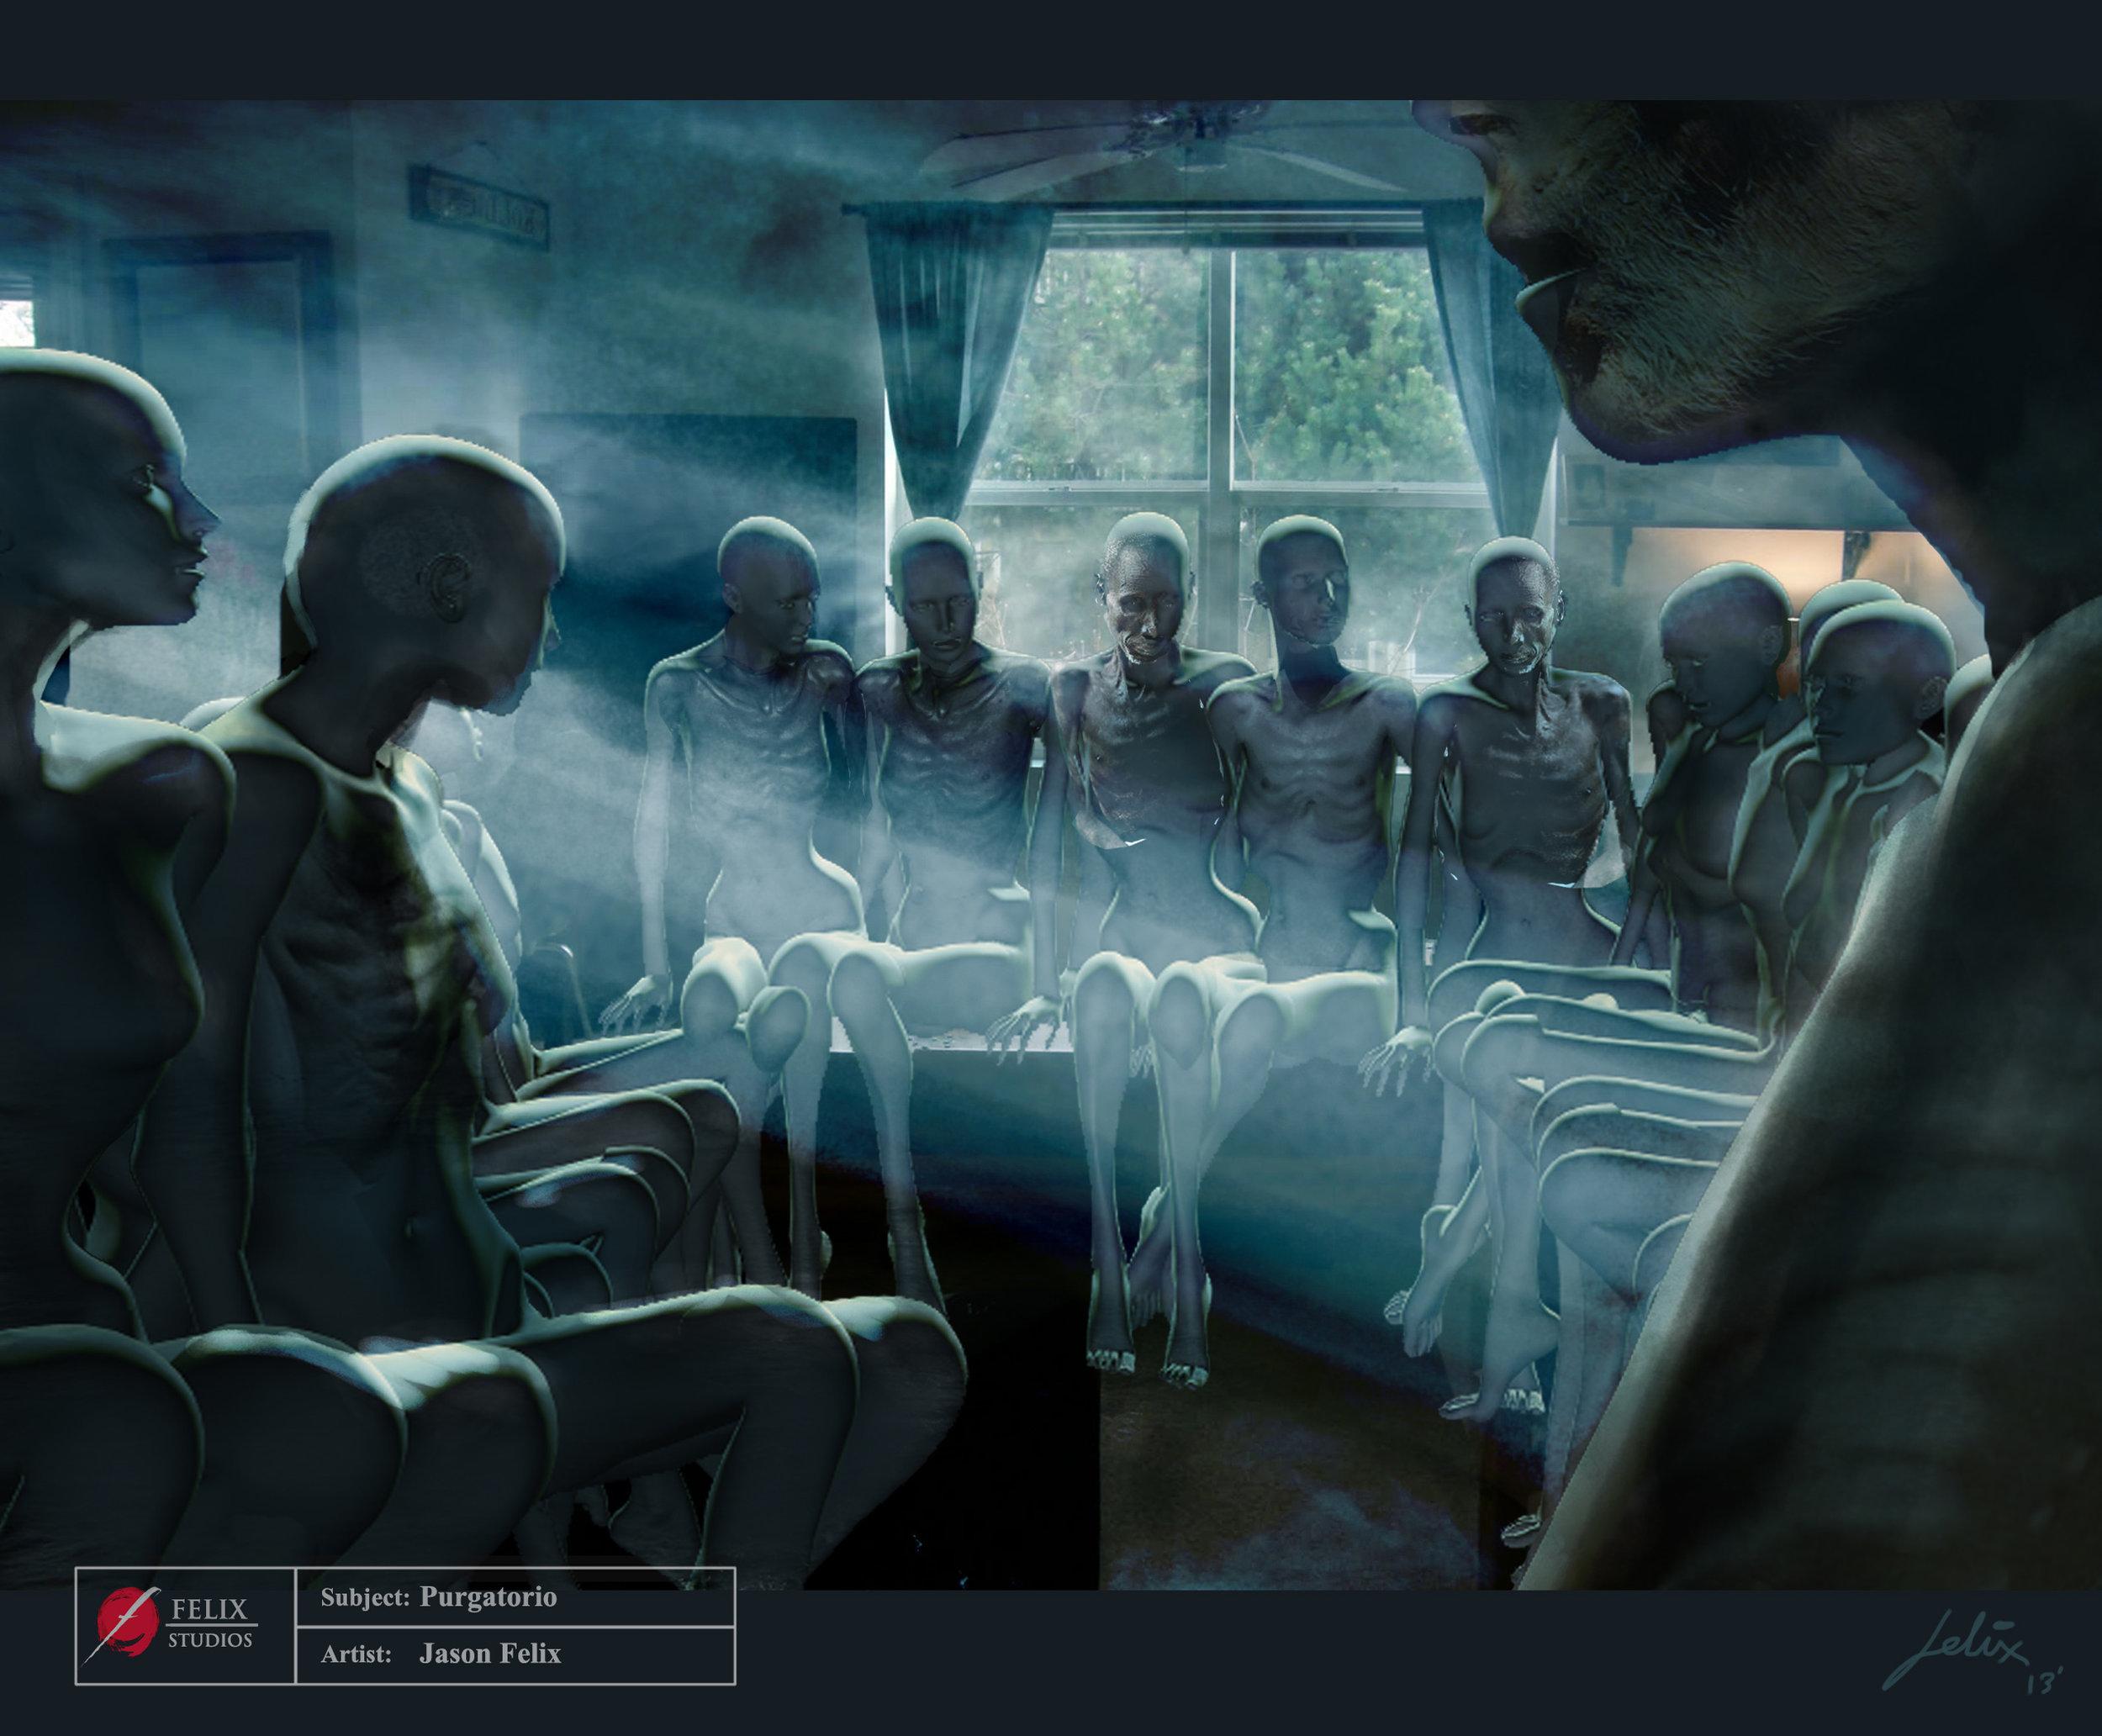 felix-purgatory-03.jpg